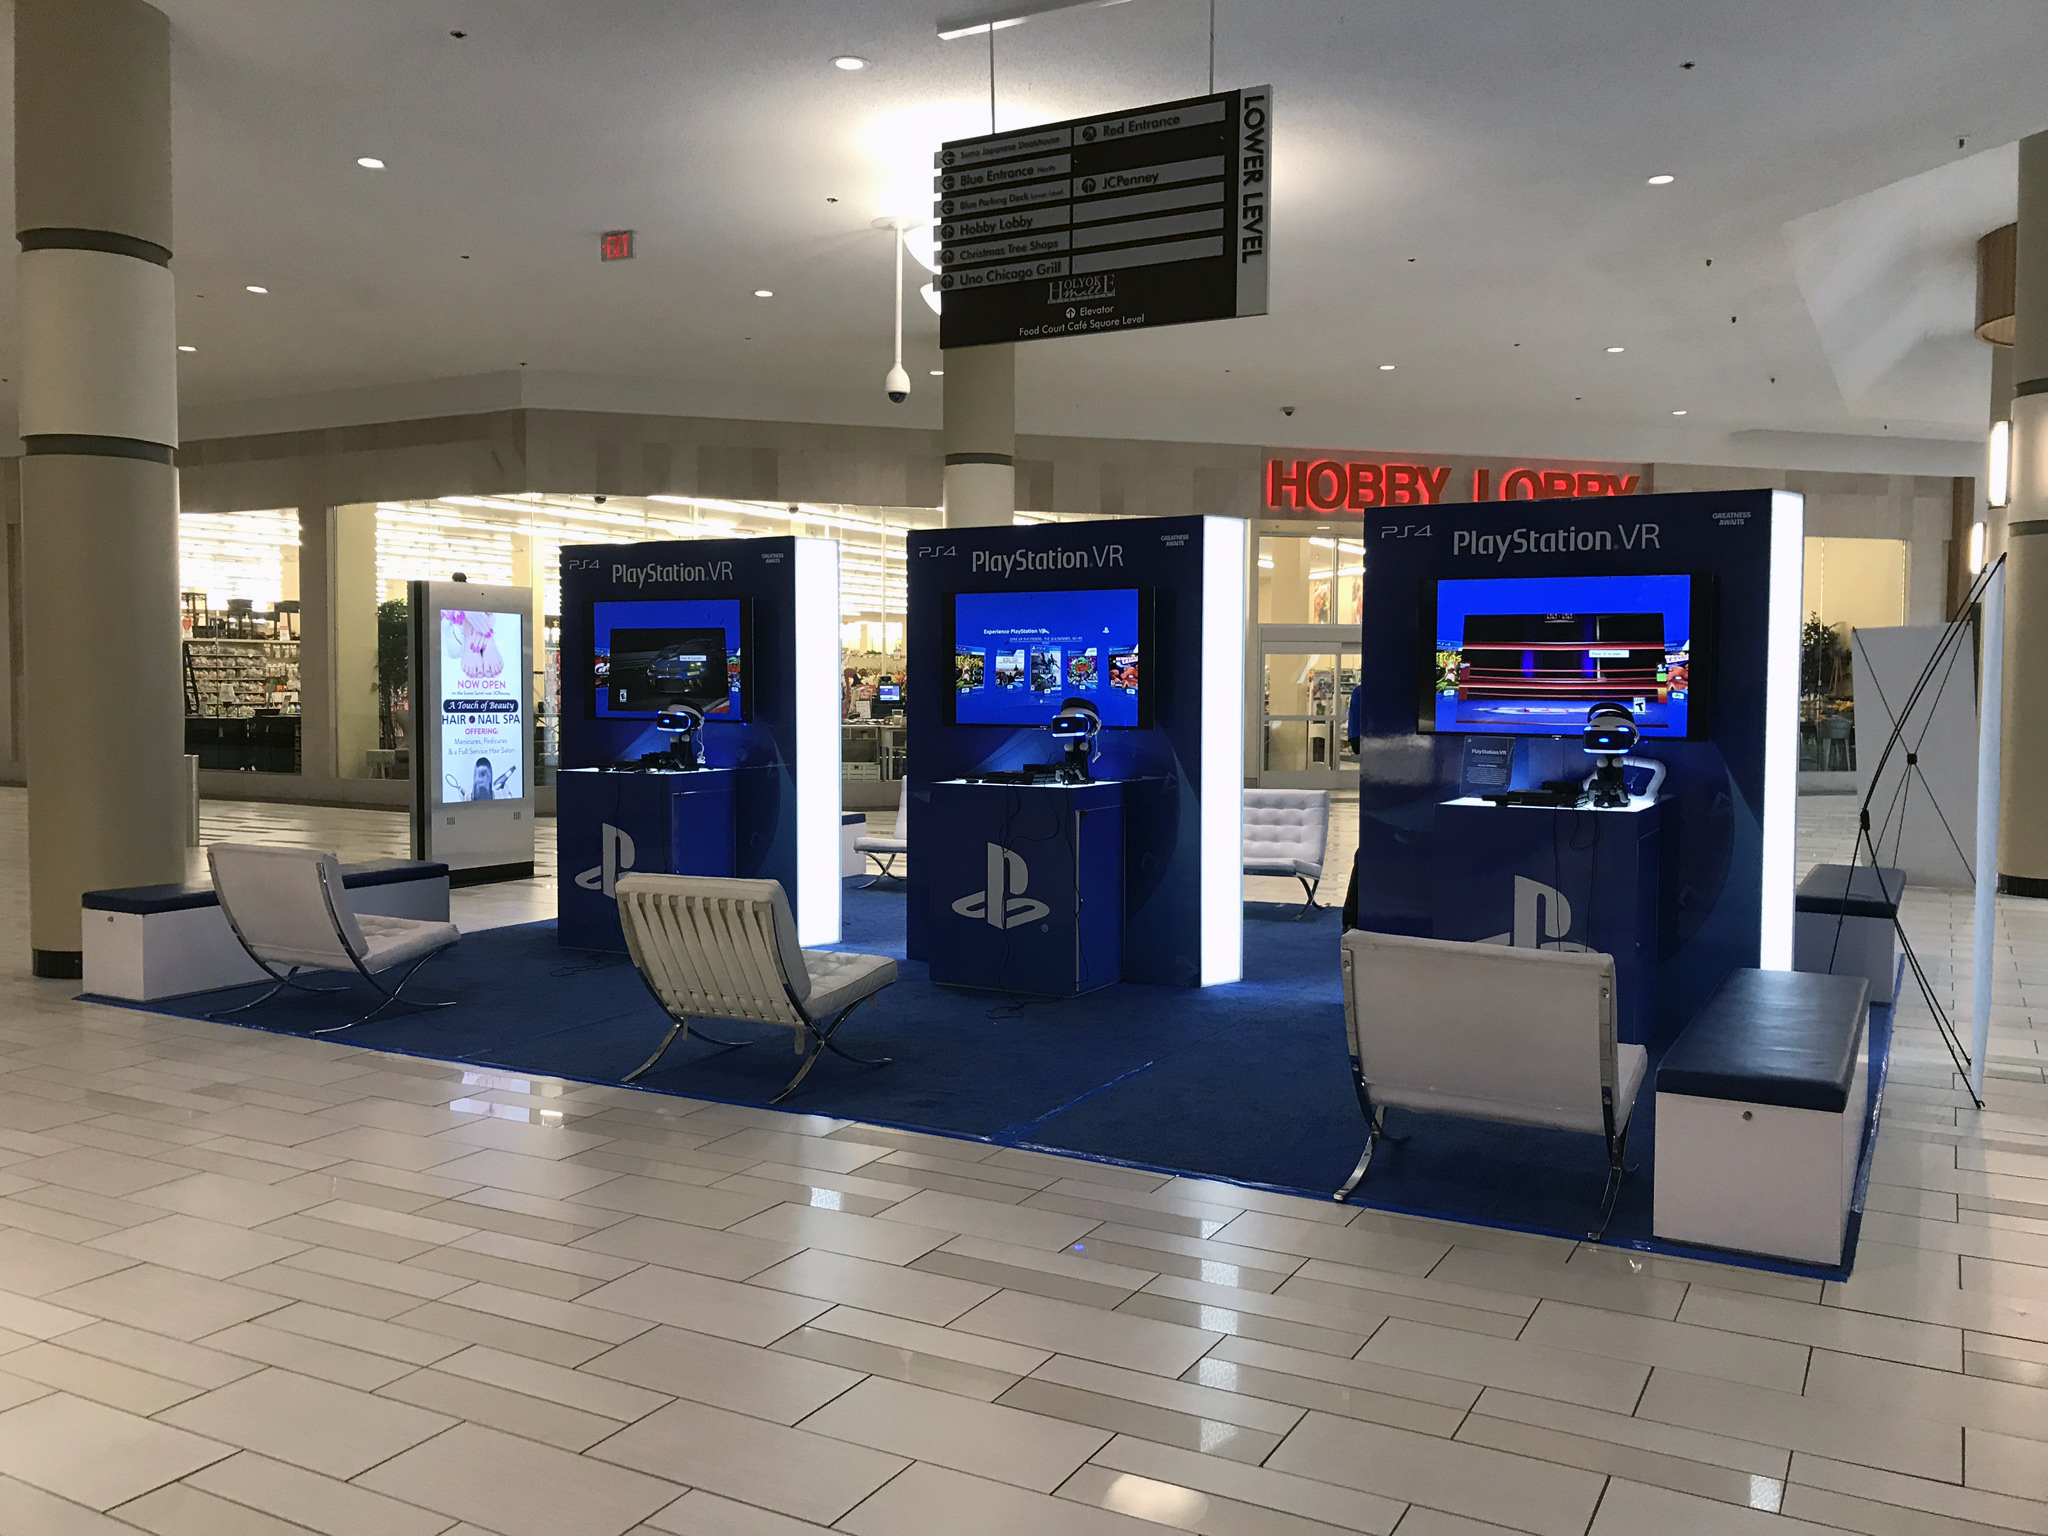 Playstation Vr Tour Live At Holyoke Mall Holyoke Mall